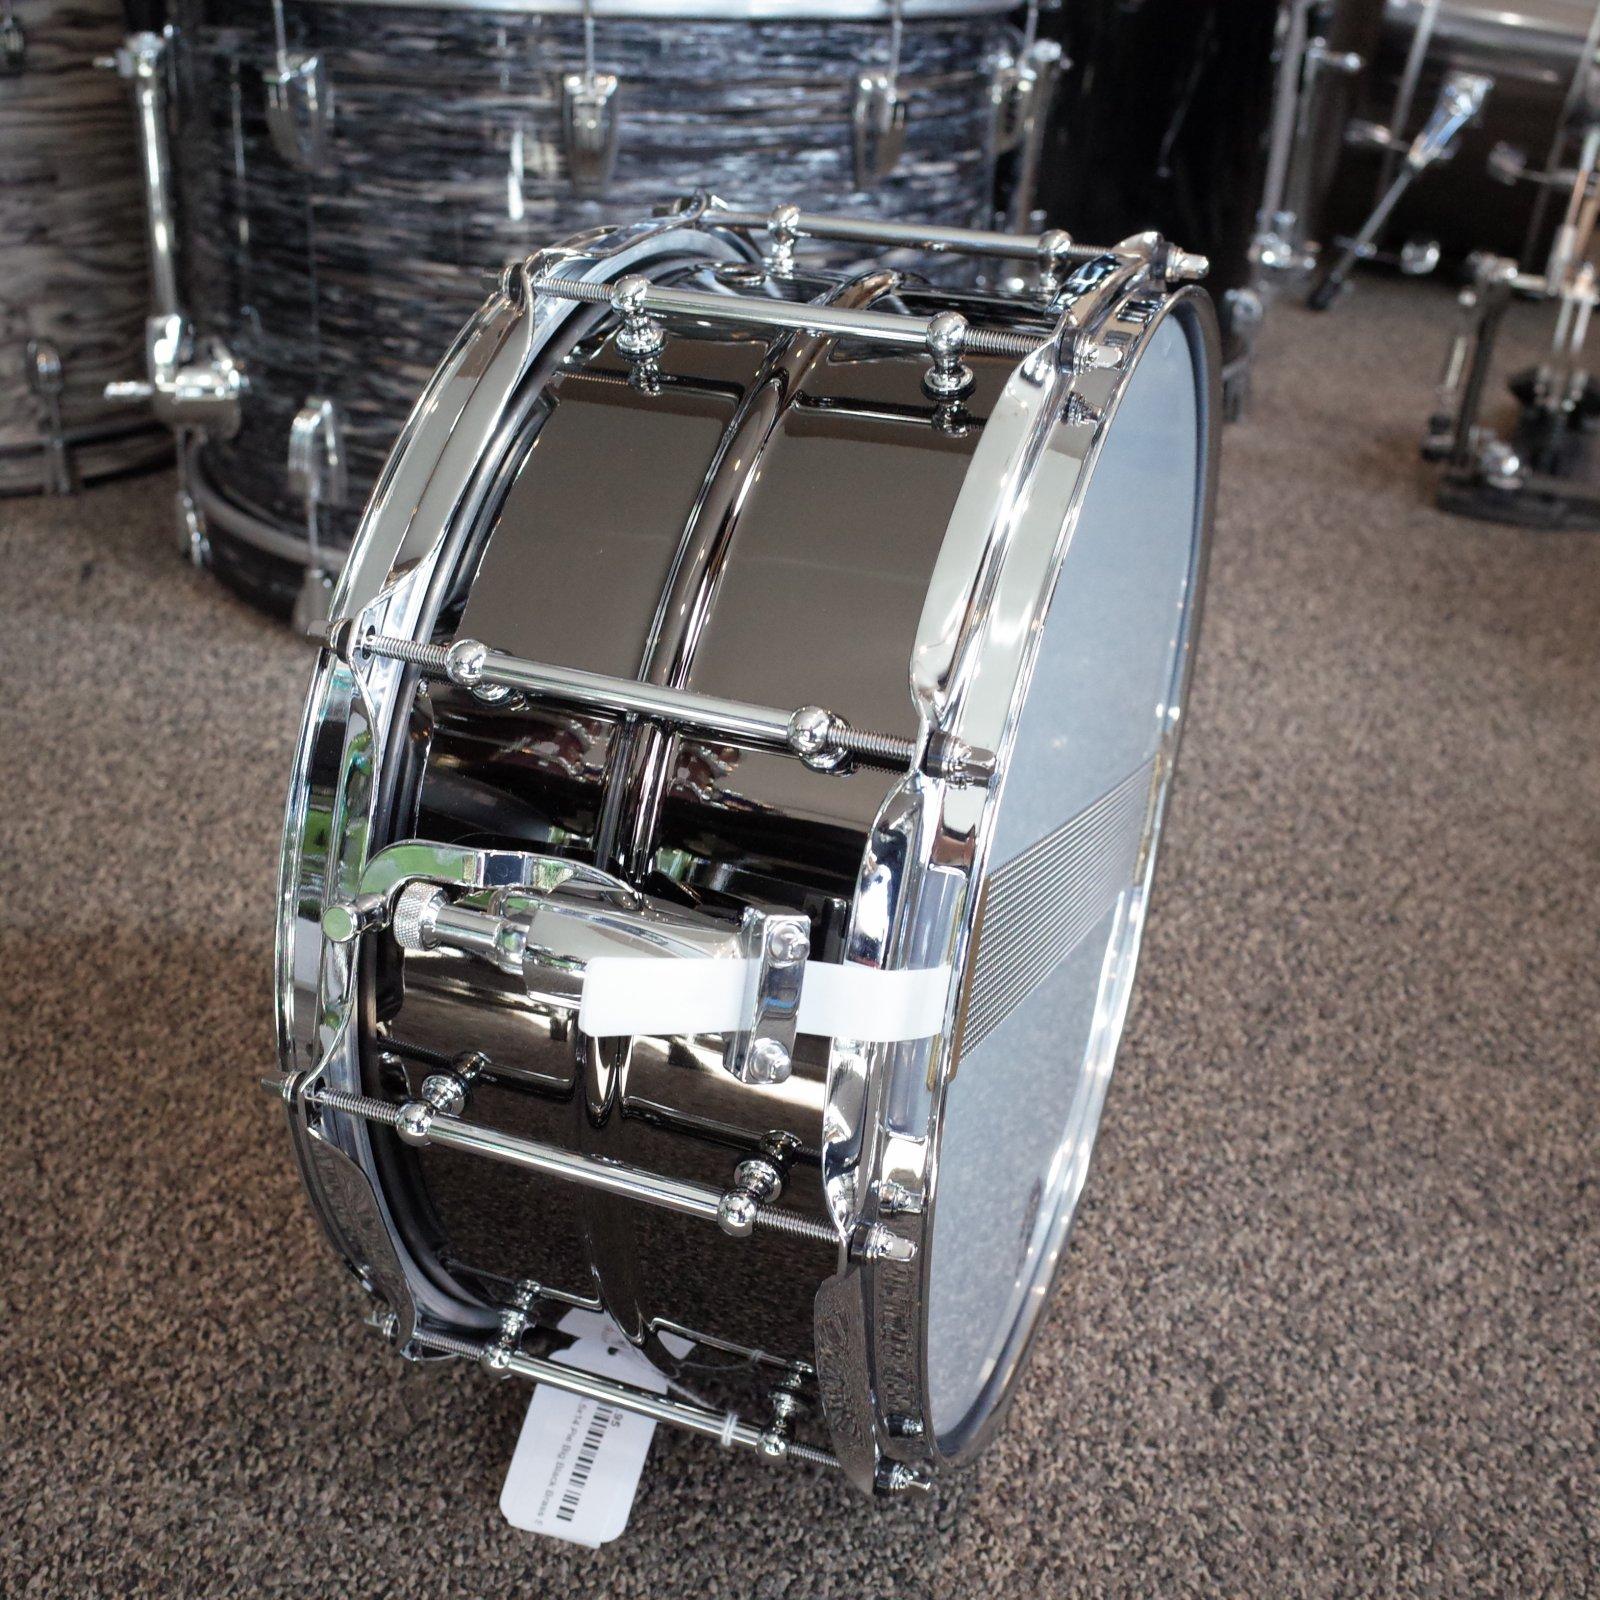 Pork 6.5x14 Pie Big Black Brass Snare Drum (USED)